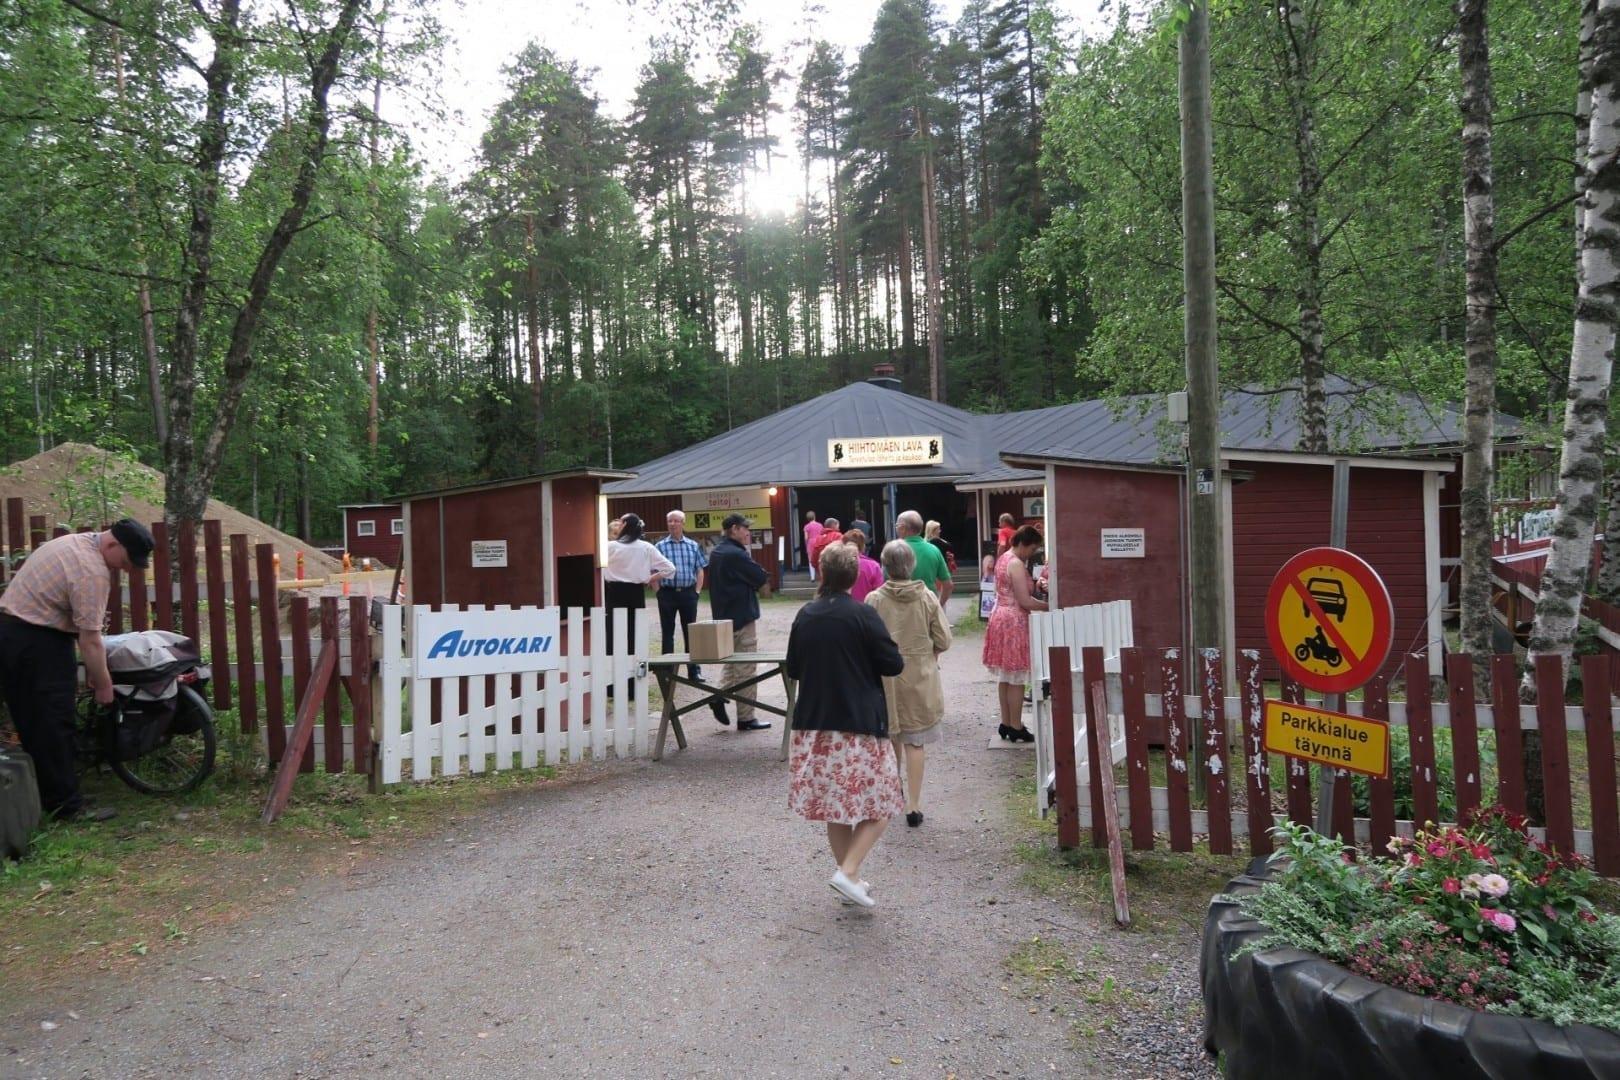 Pabellón de baile Hiihtomäki. Mikkeli Finlandia